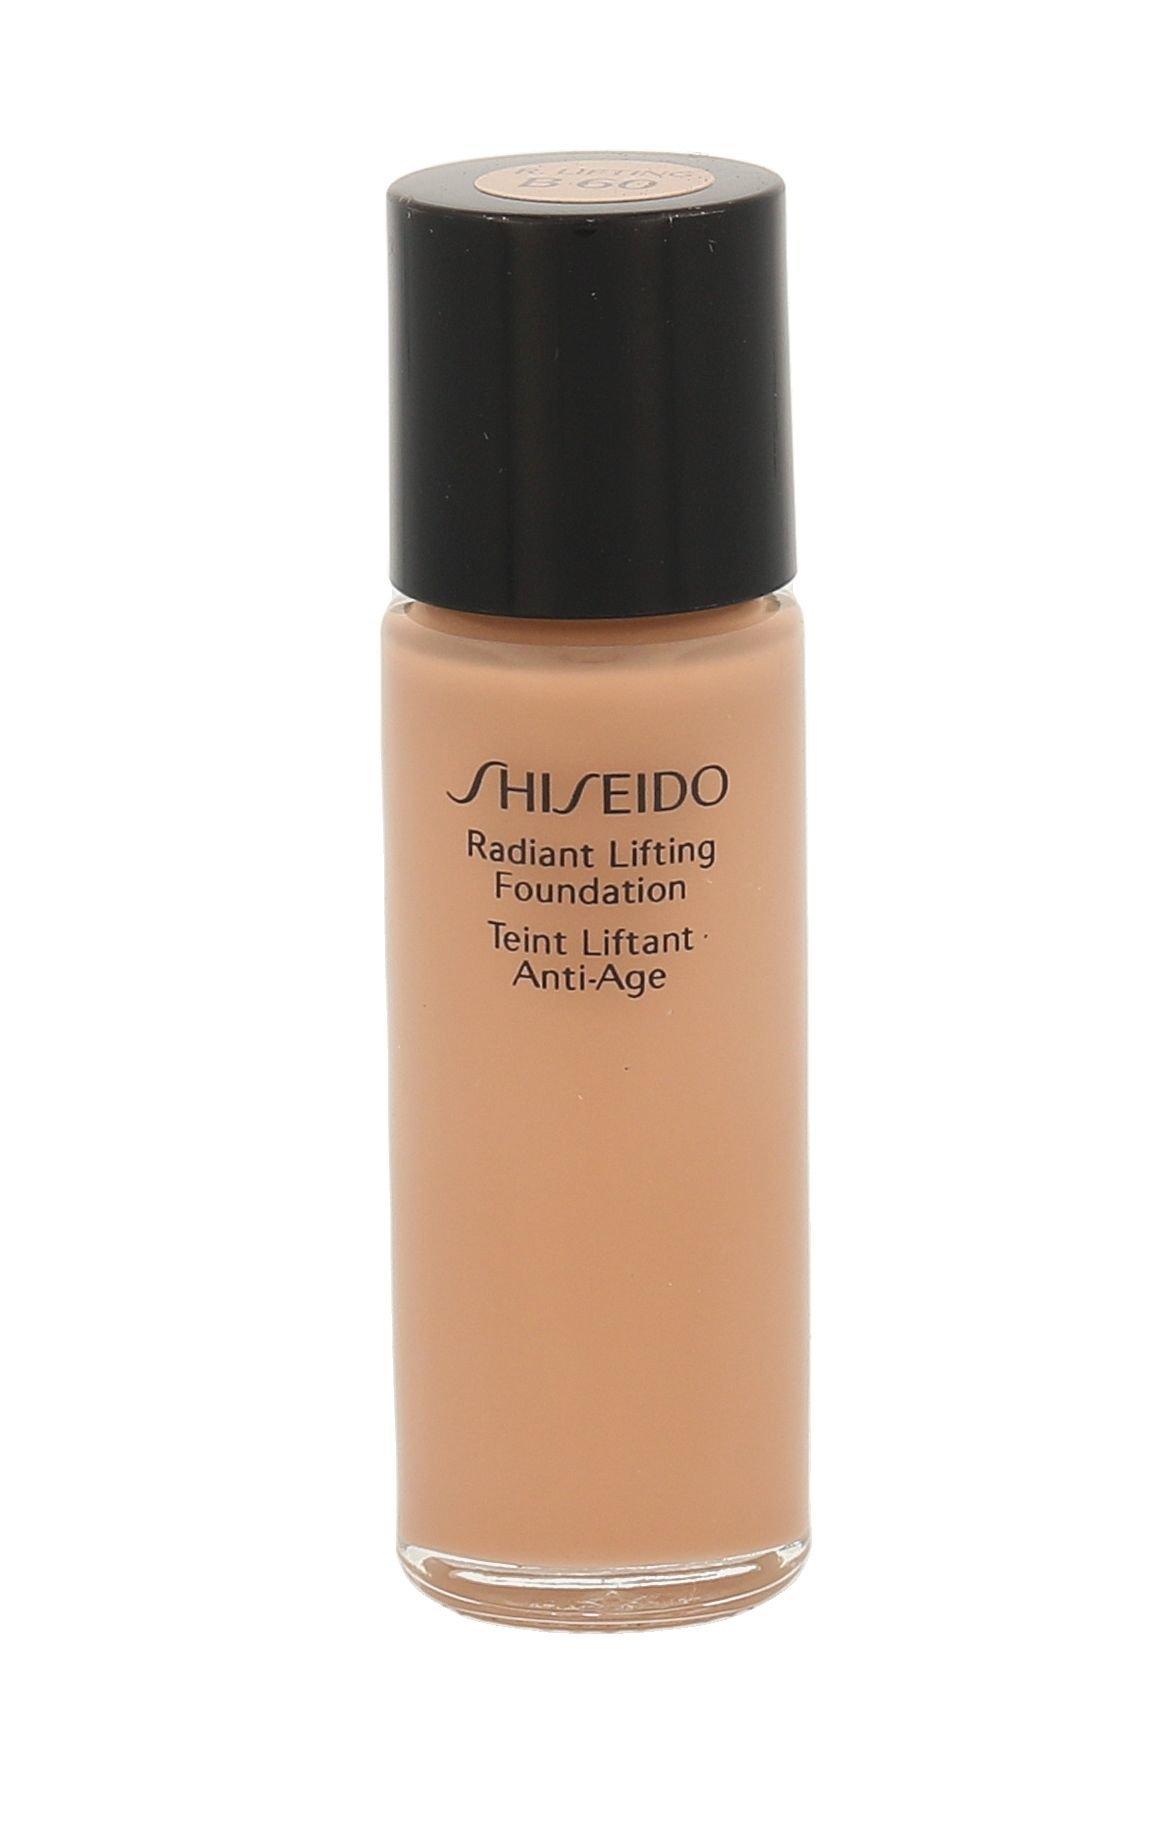 Shiseido Radiant Lifting Foundation Cosmetic 15ml B60 Natural Deep Beige